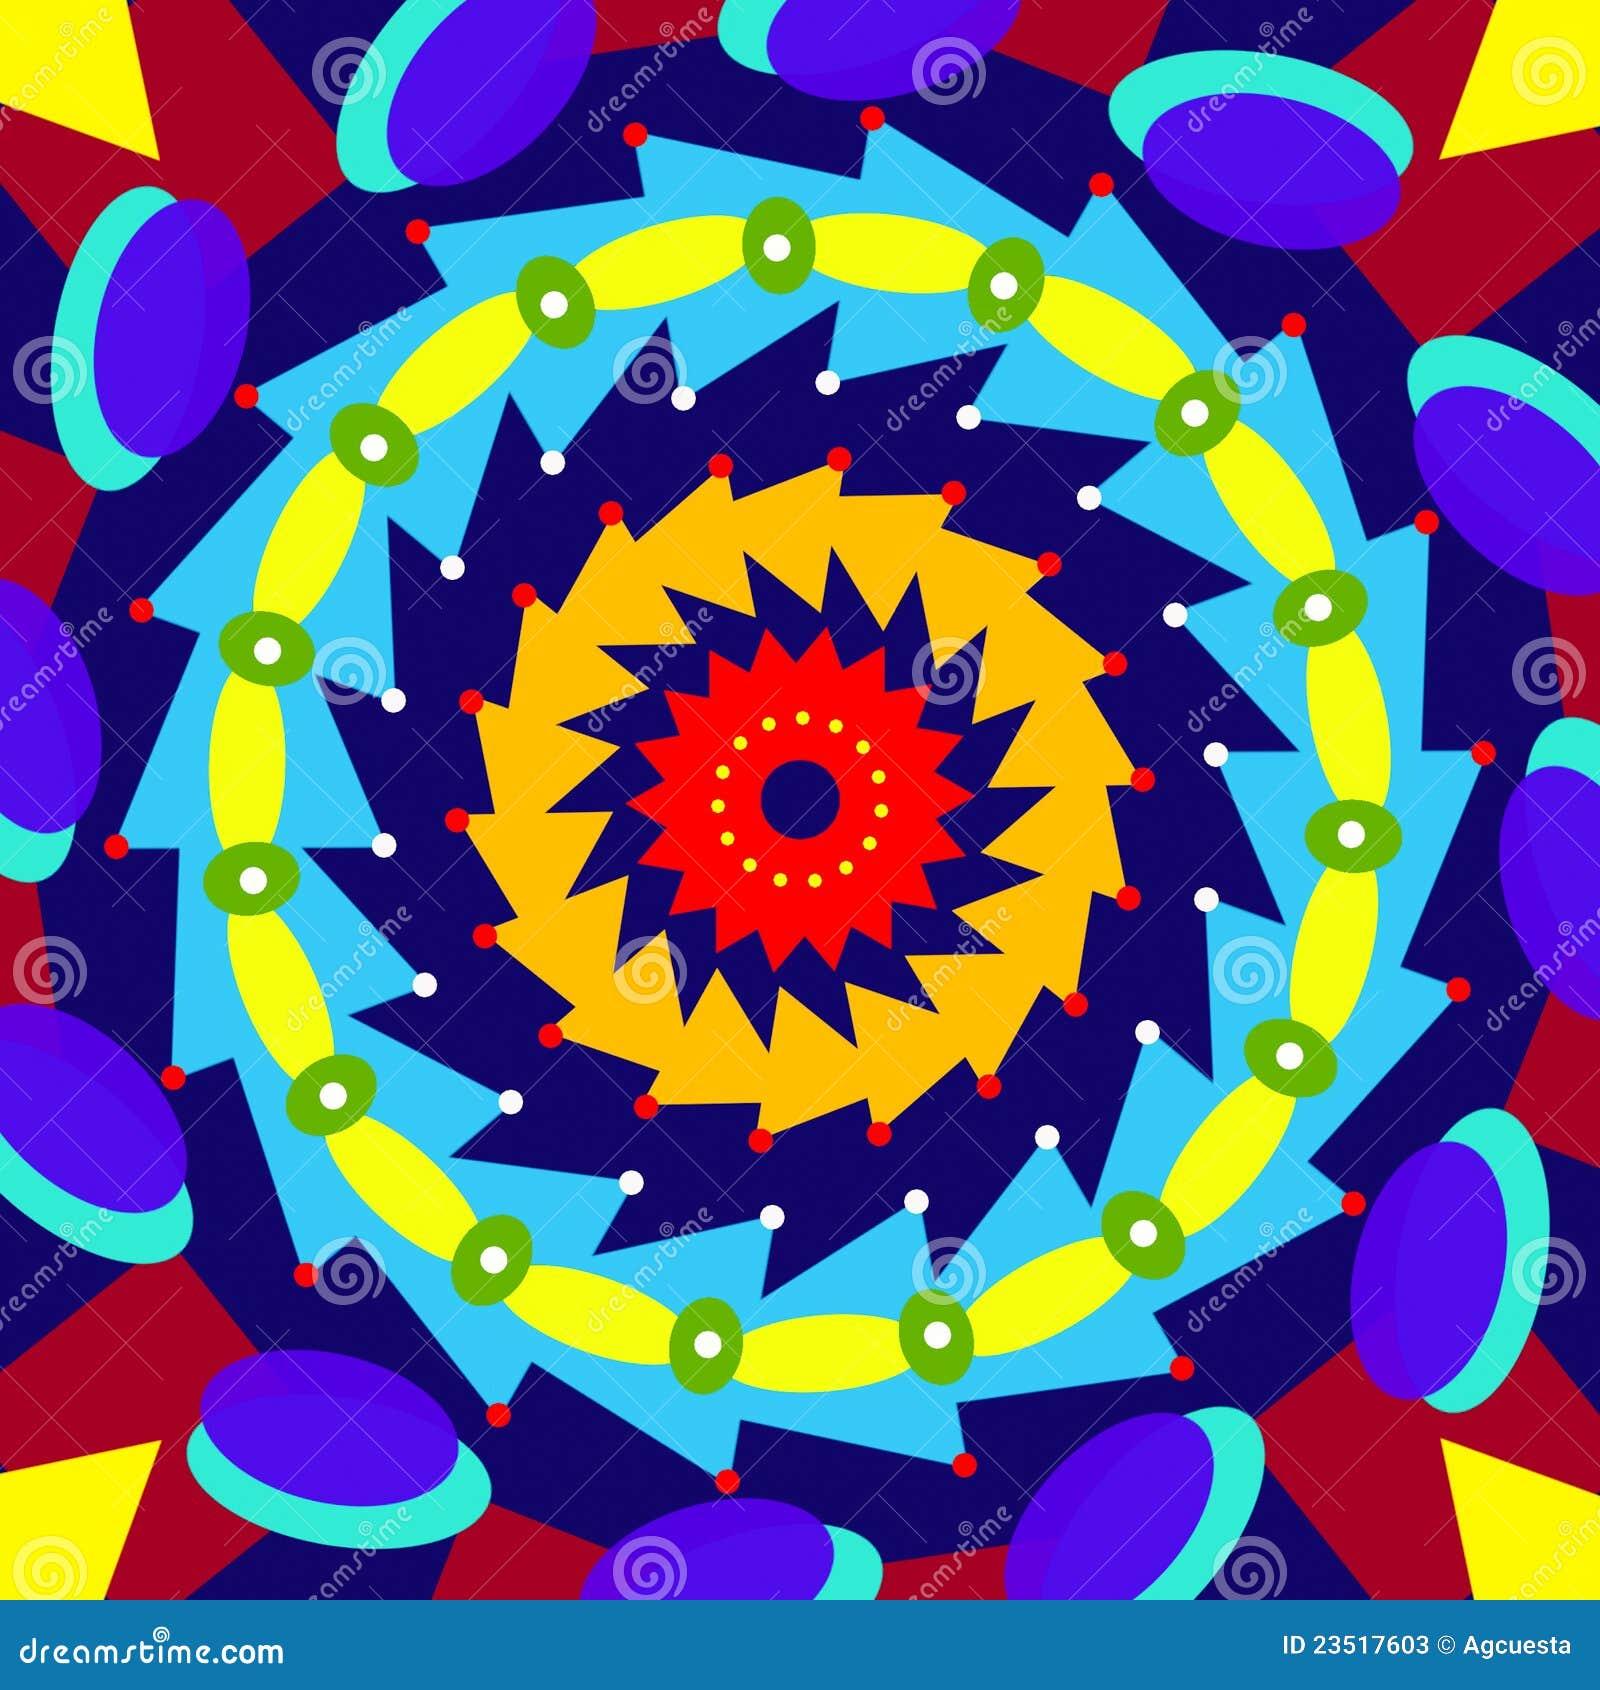 Mandala Colorida Geometrica Circulo Sagrado Ilustracao Stock